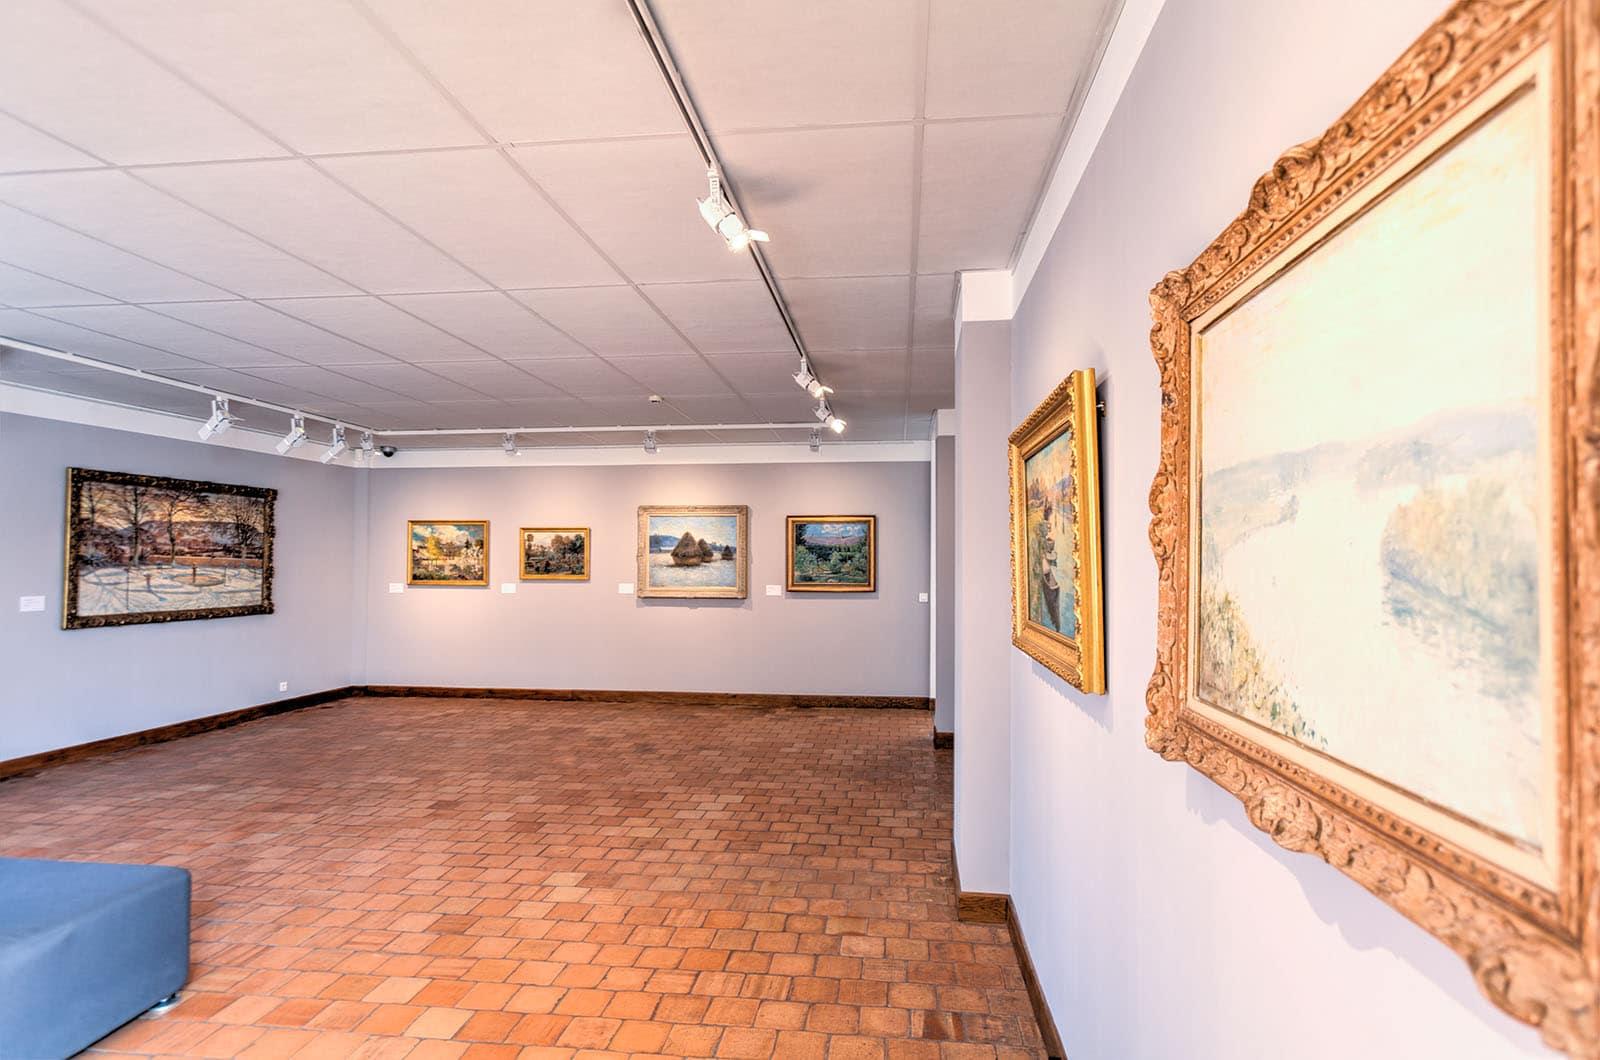 Musée-de Vernon - Franck Godard